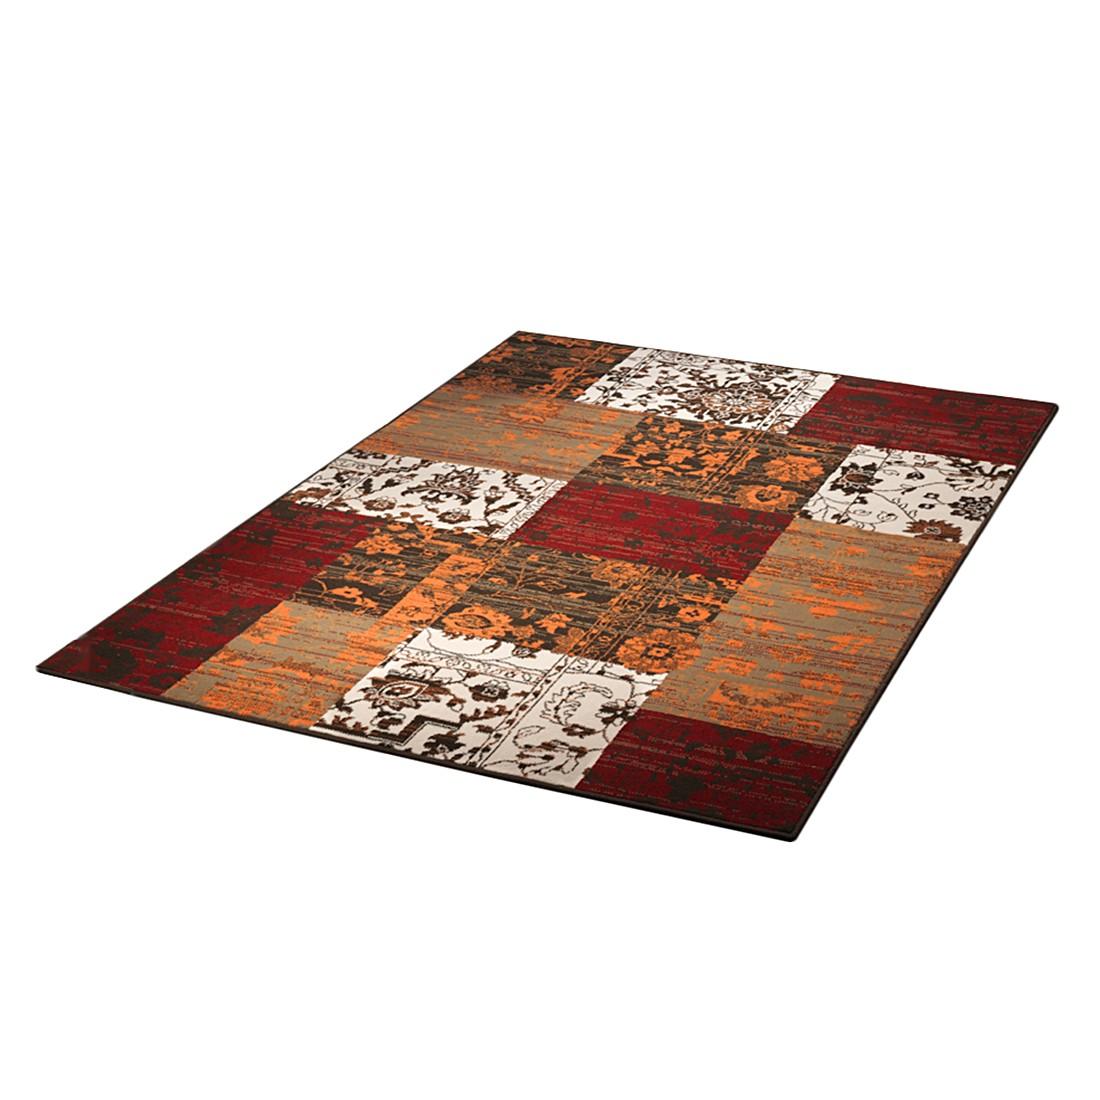 Teppich Prime Pile Billi Jean - Terra - 160 x 230 cm, Hanse Home Collection